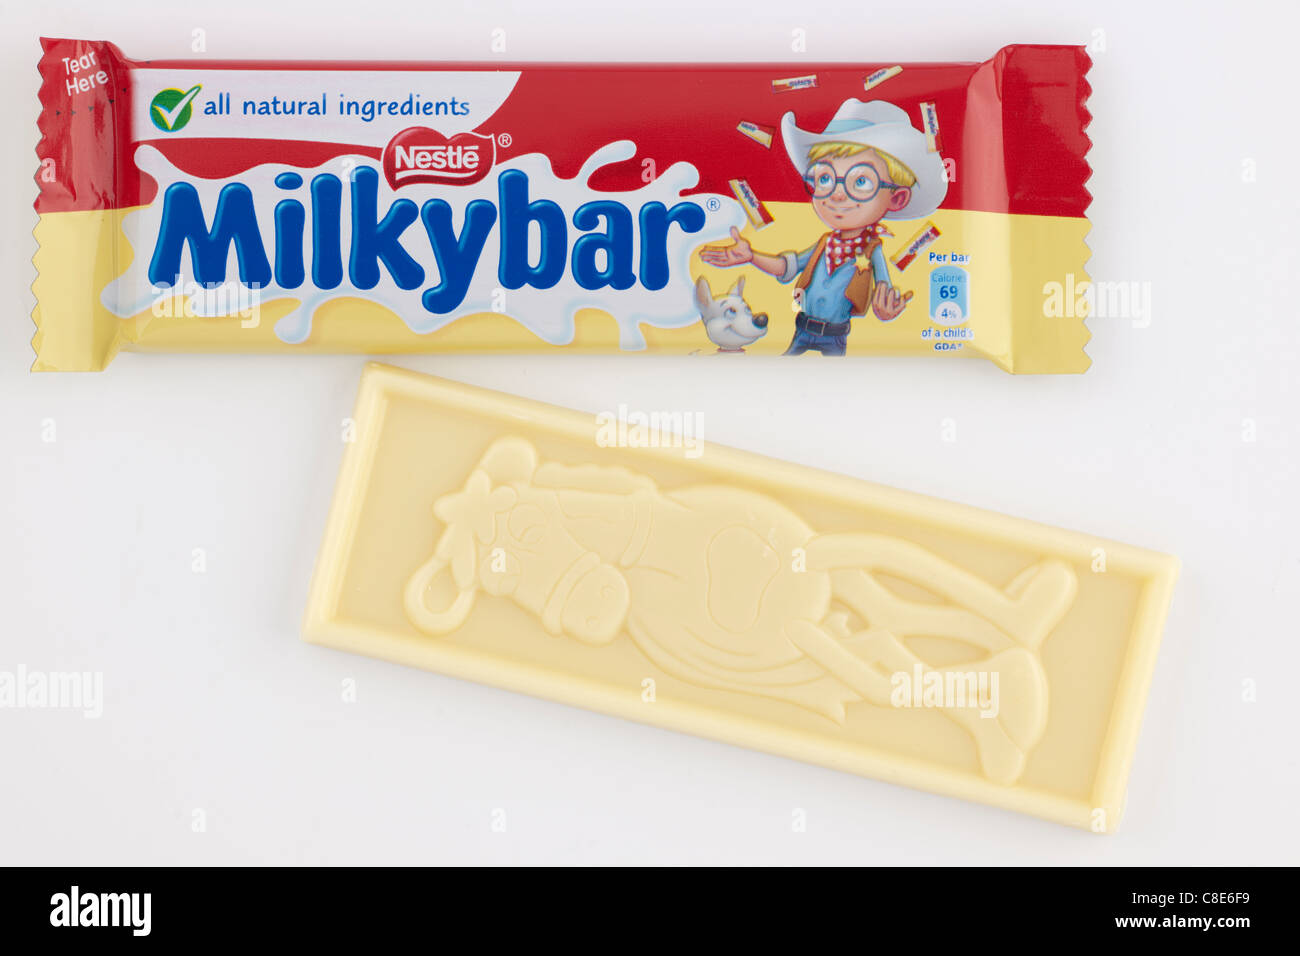 nestle milky bar chocolate - photo #23